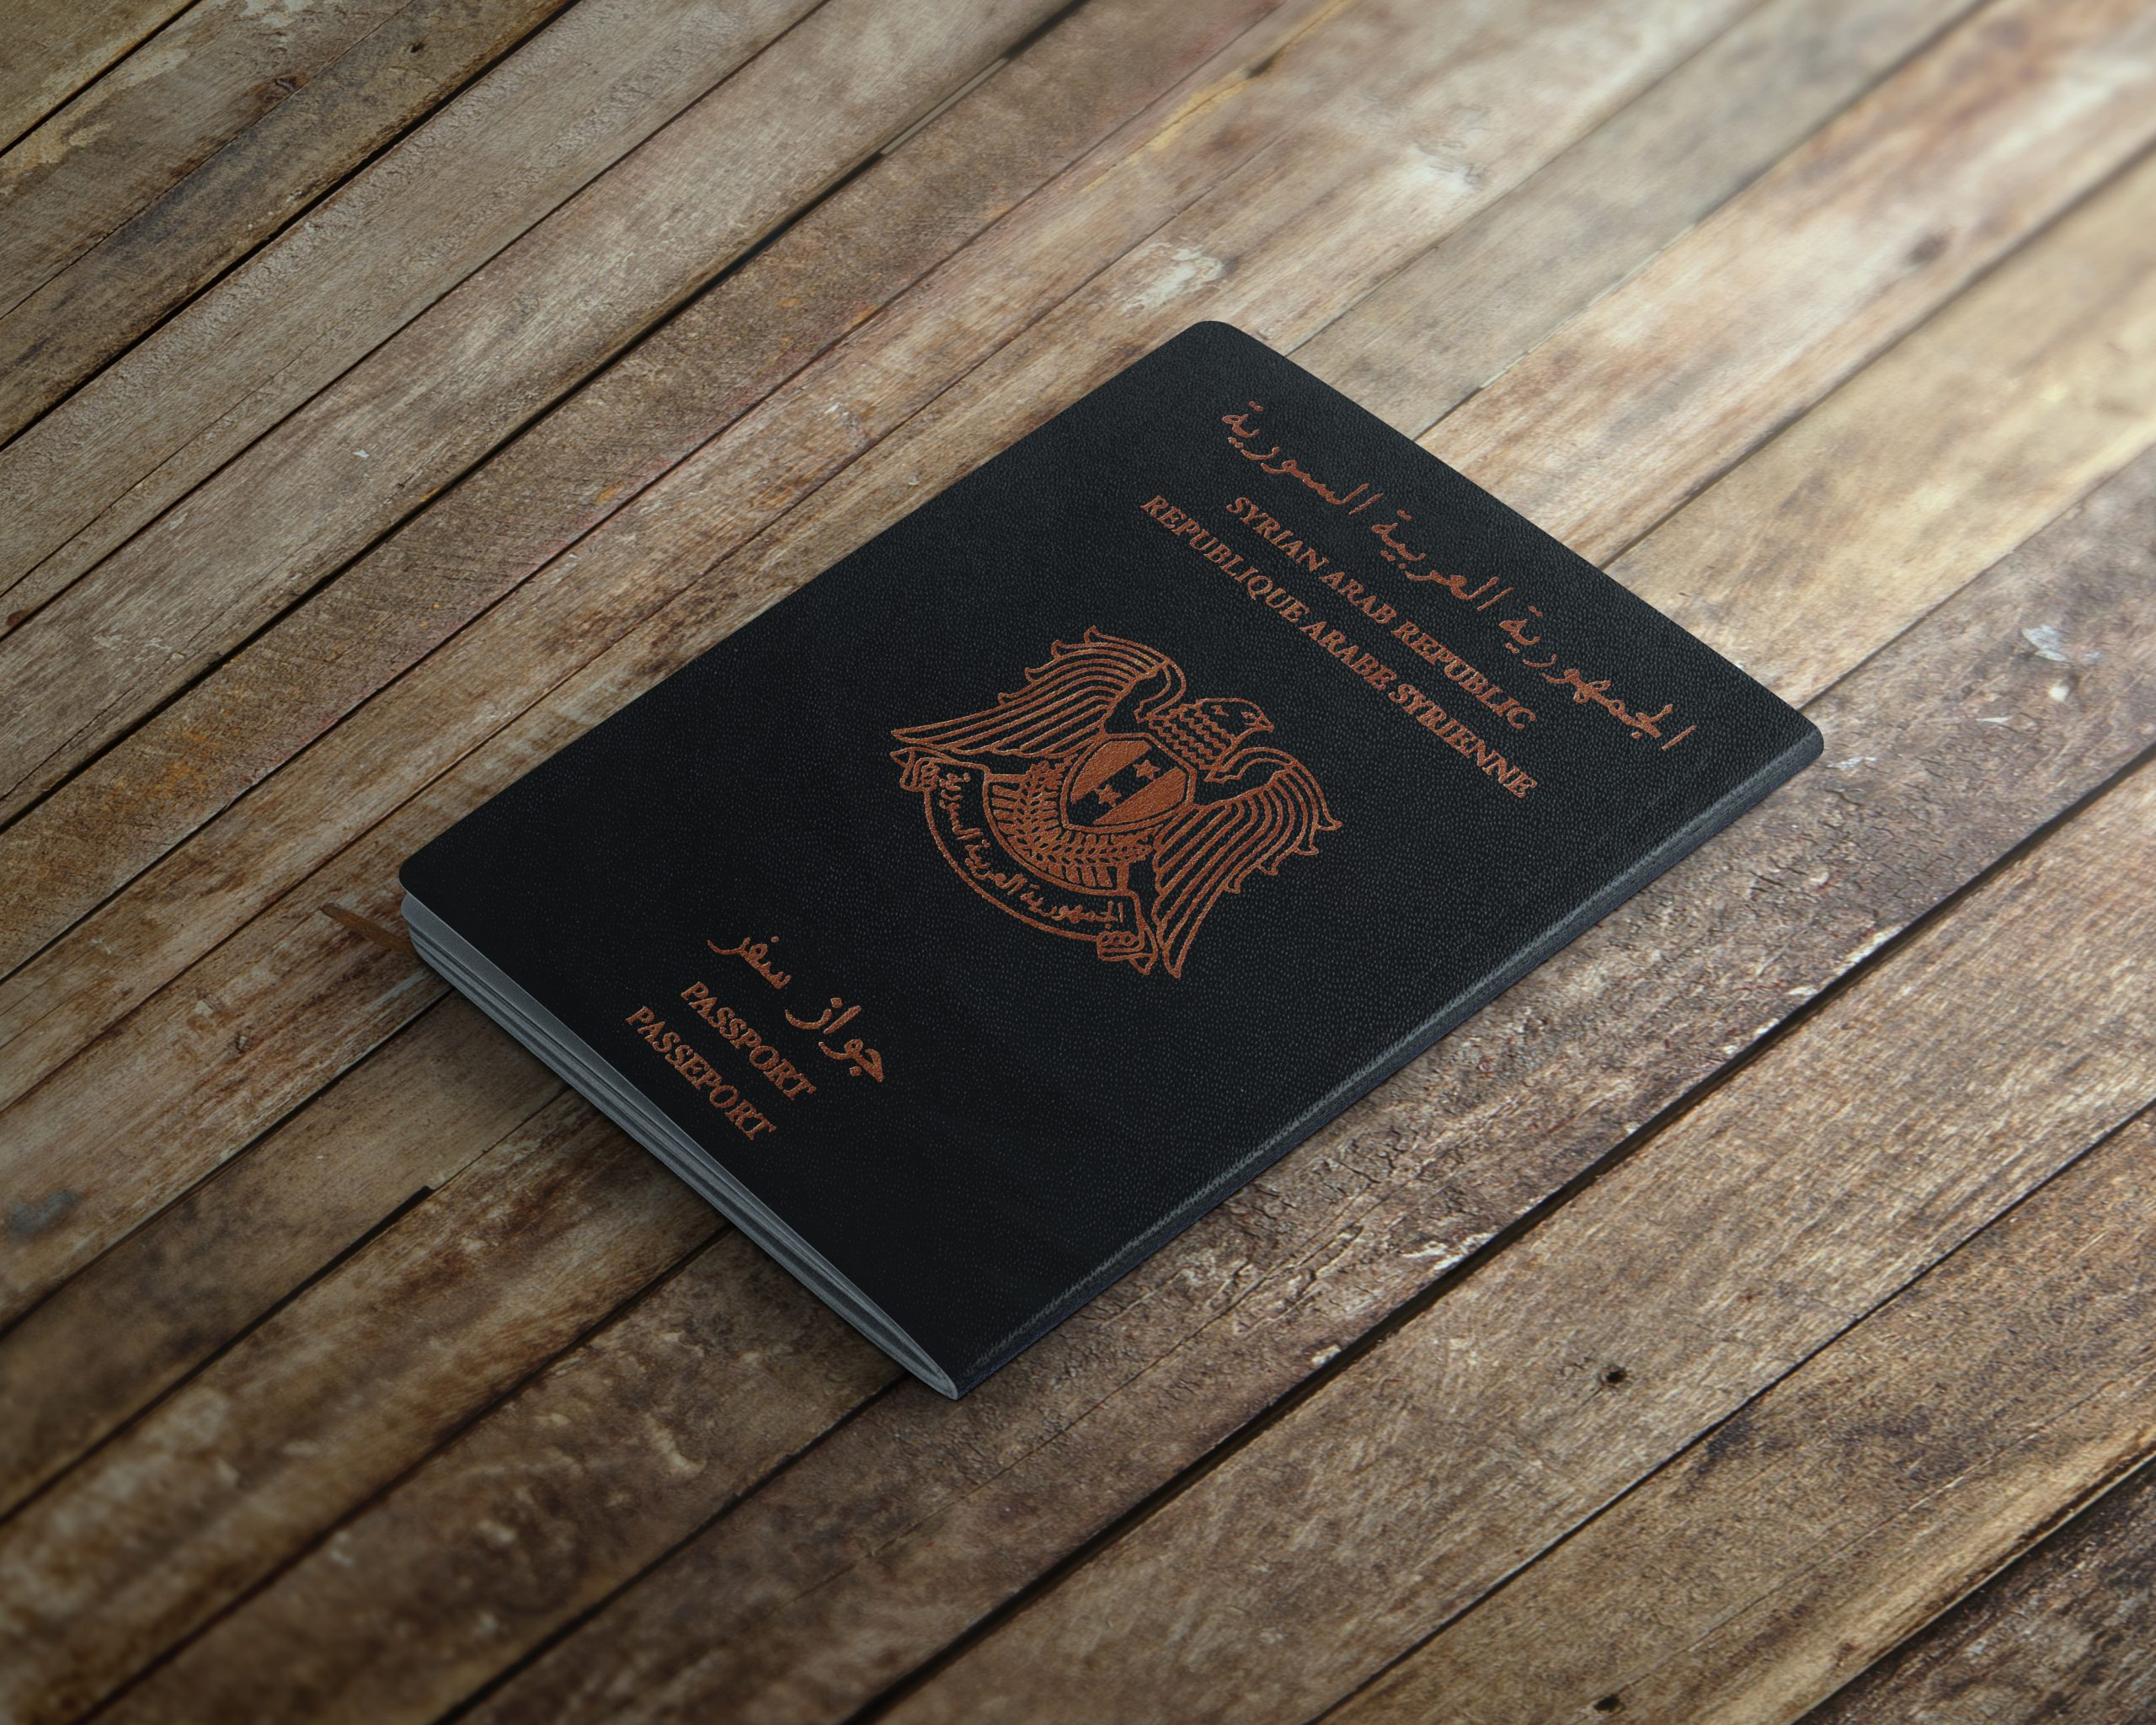 Syrian Passport Visa Free Countries 2021